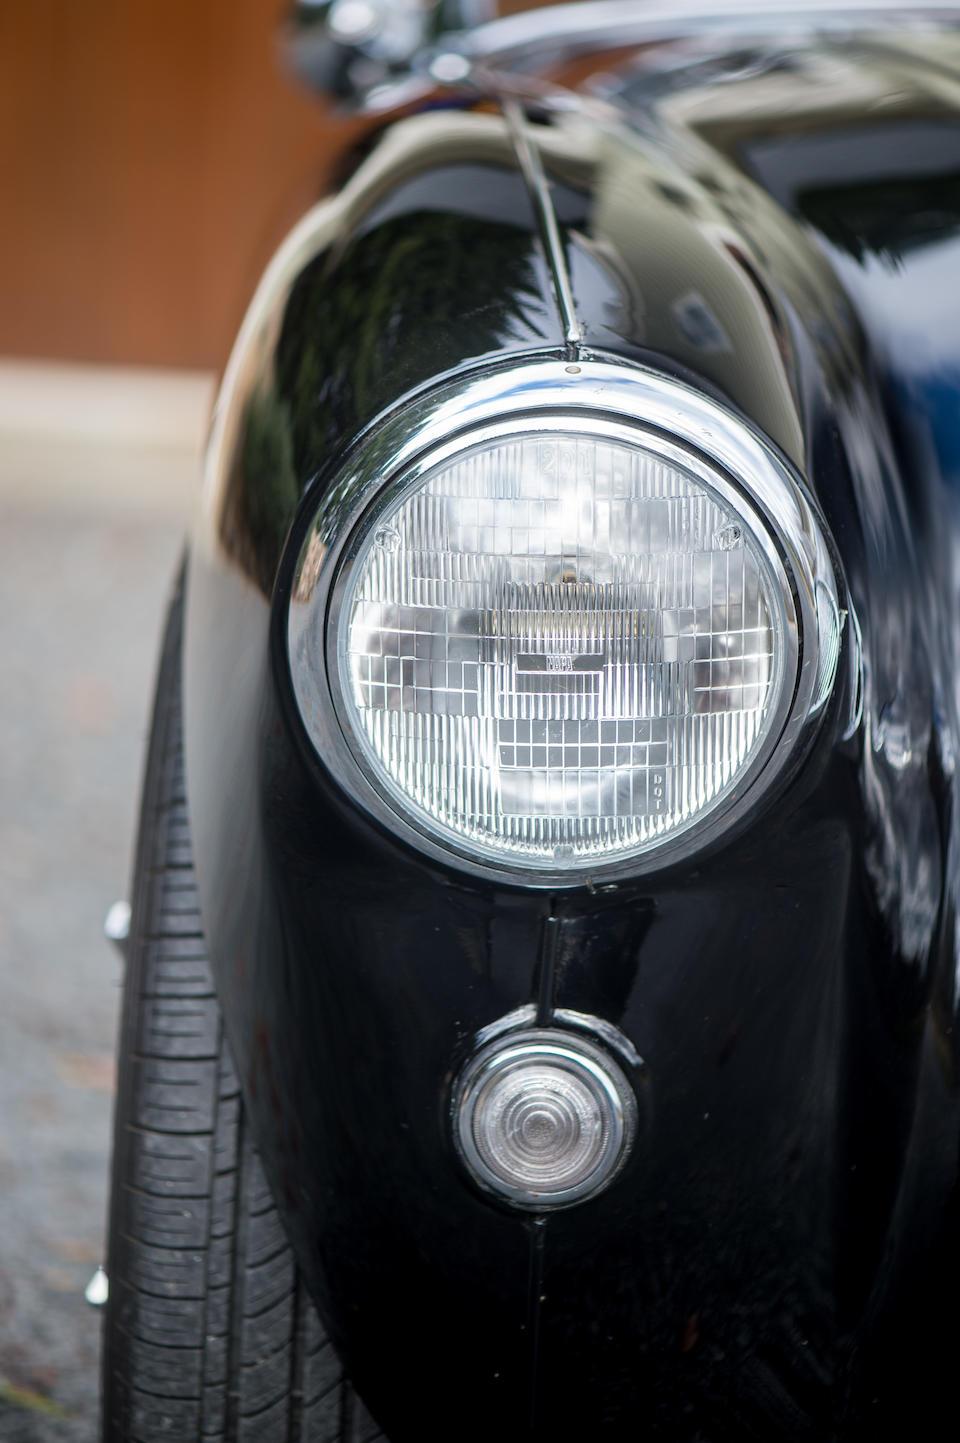 <b>1955 Austin Healey 100-4 BN1 Custom Roadster</b><br />Chassis no. BN1L 222089